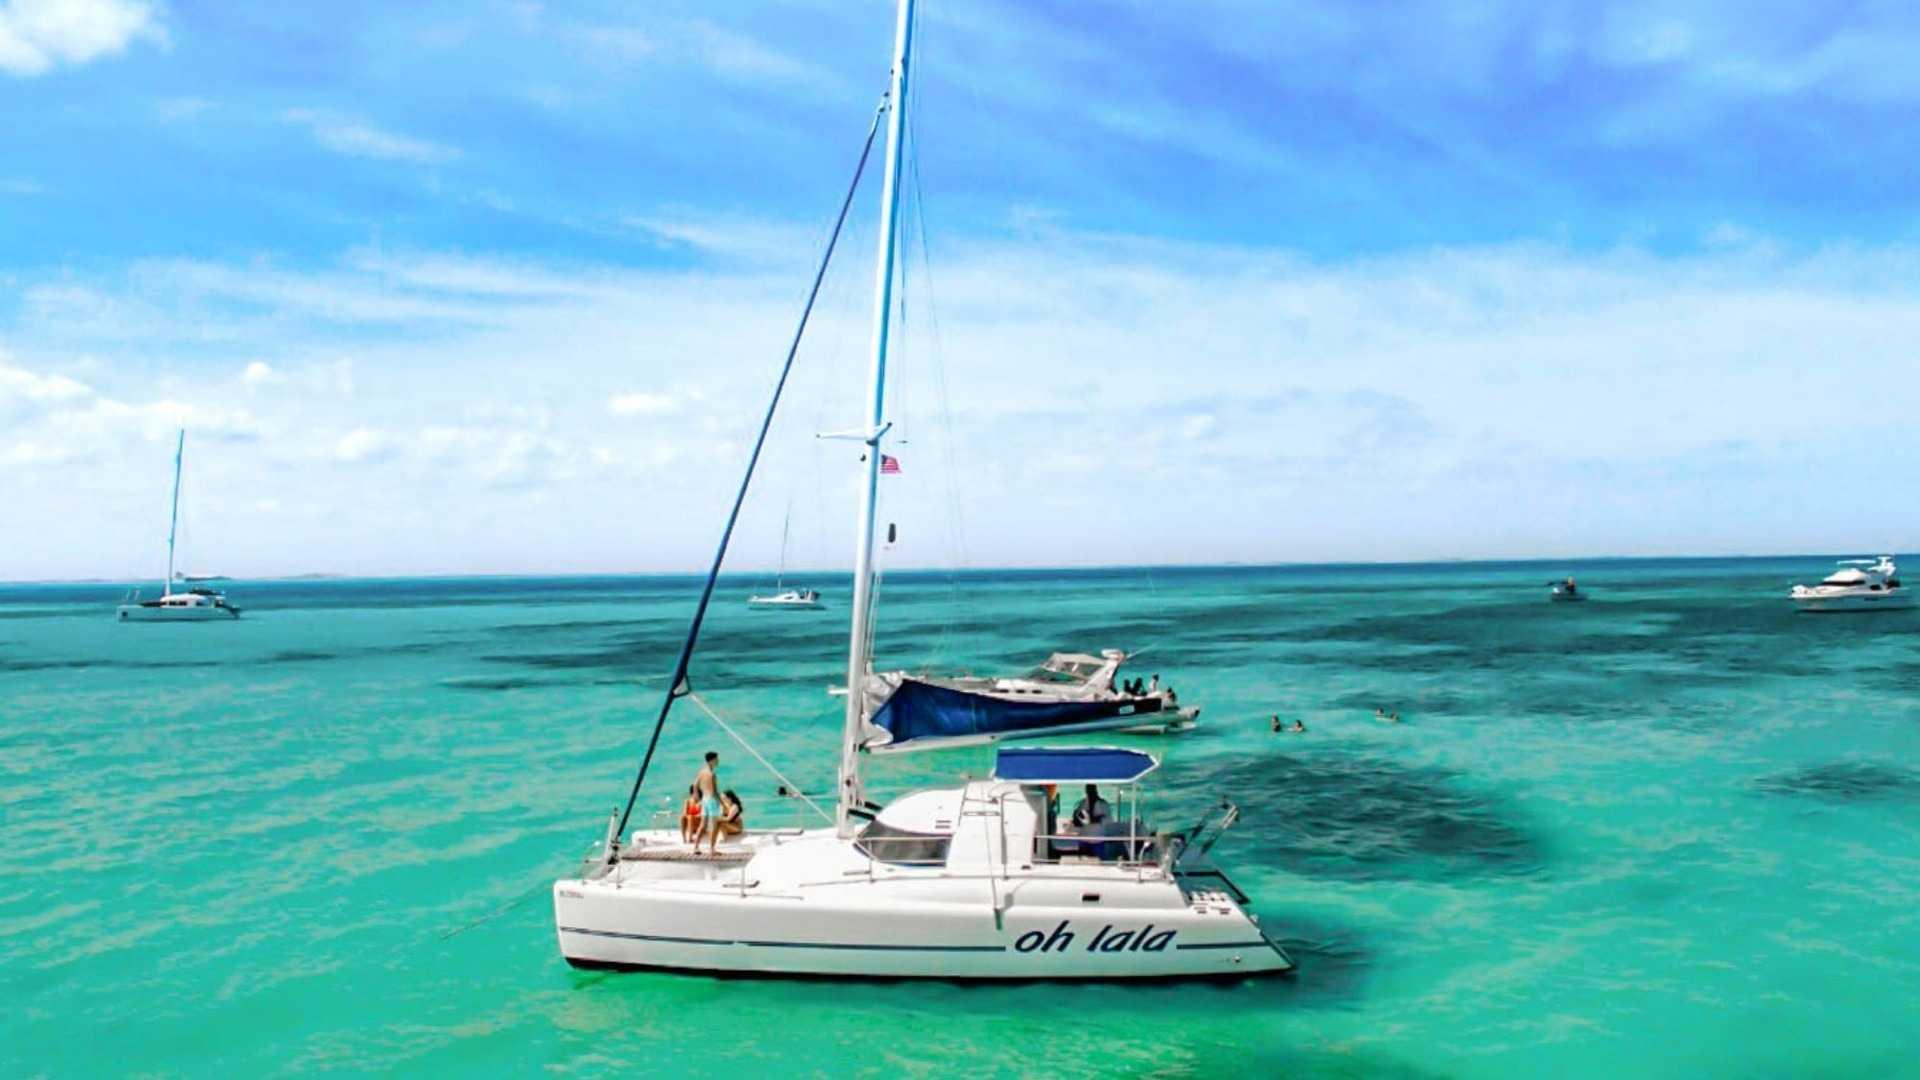 2 - LowRes - Oh La La - Private tour to Isla Mujeres in catamaran - Cancun Sailing